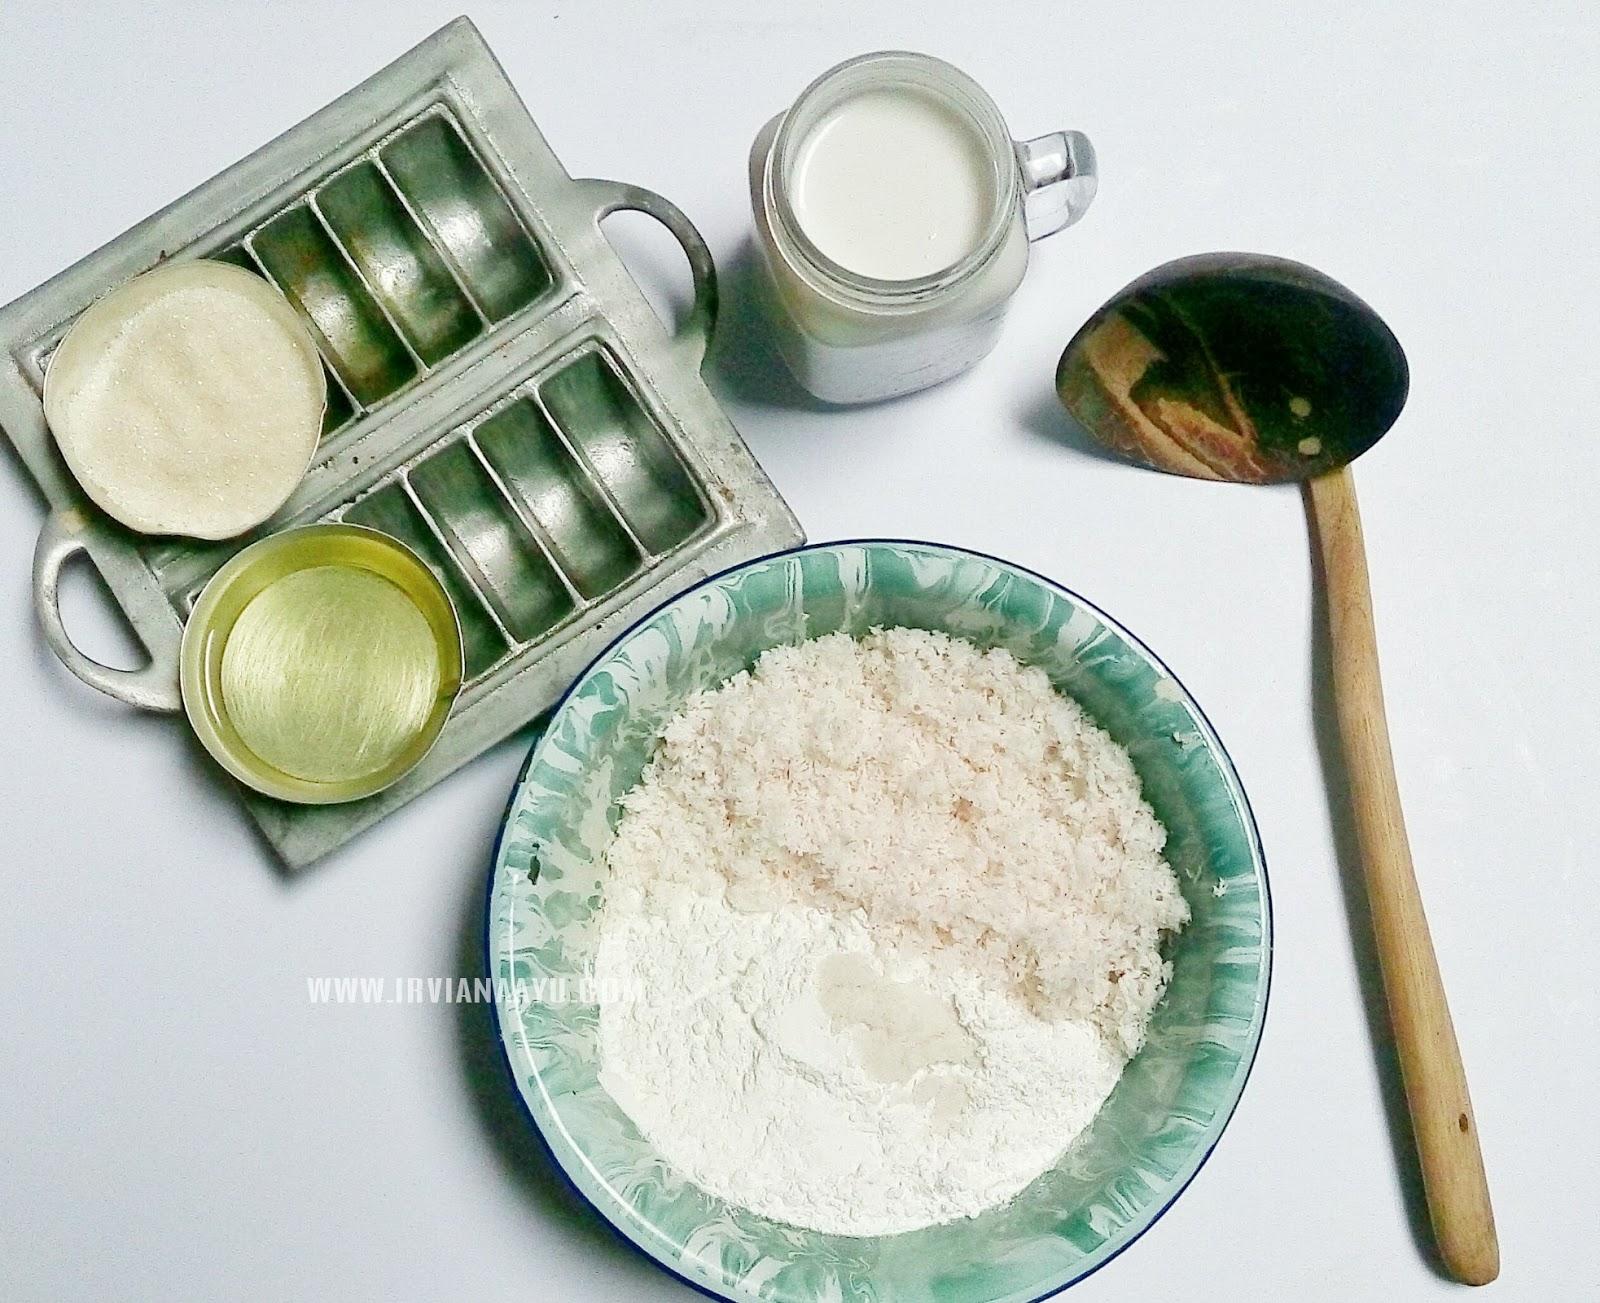 Resep Membuat Kue Pancong atau Serabi Rangin, Enak! | The